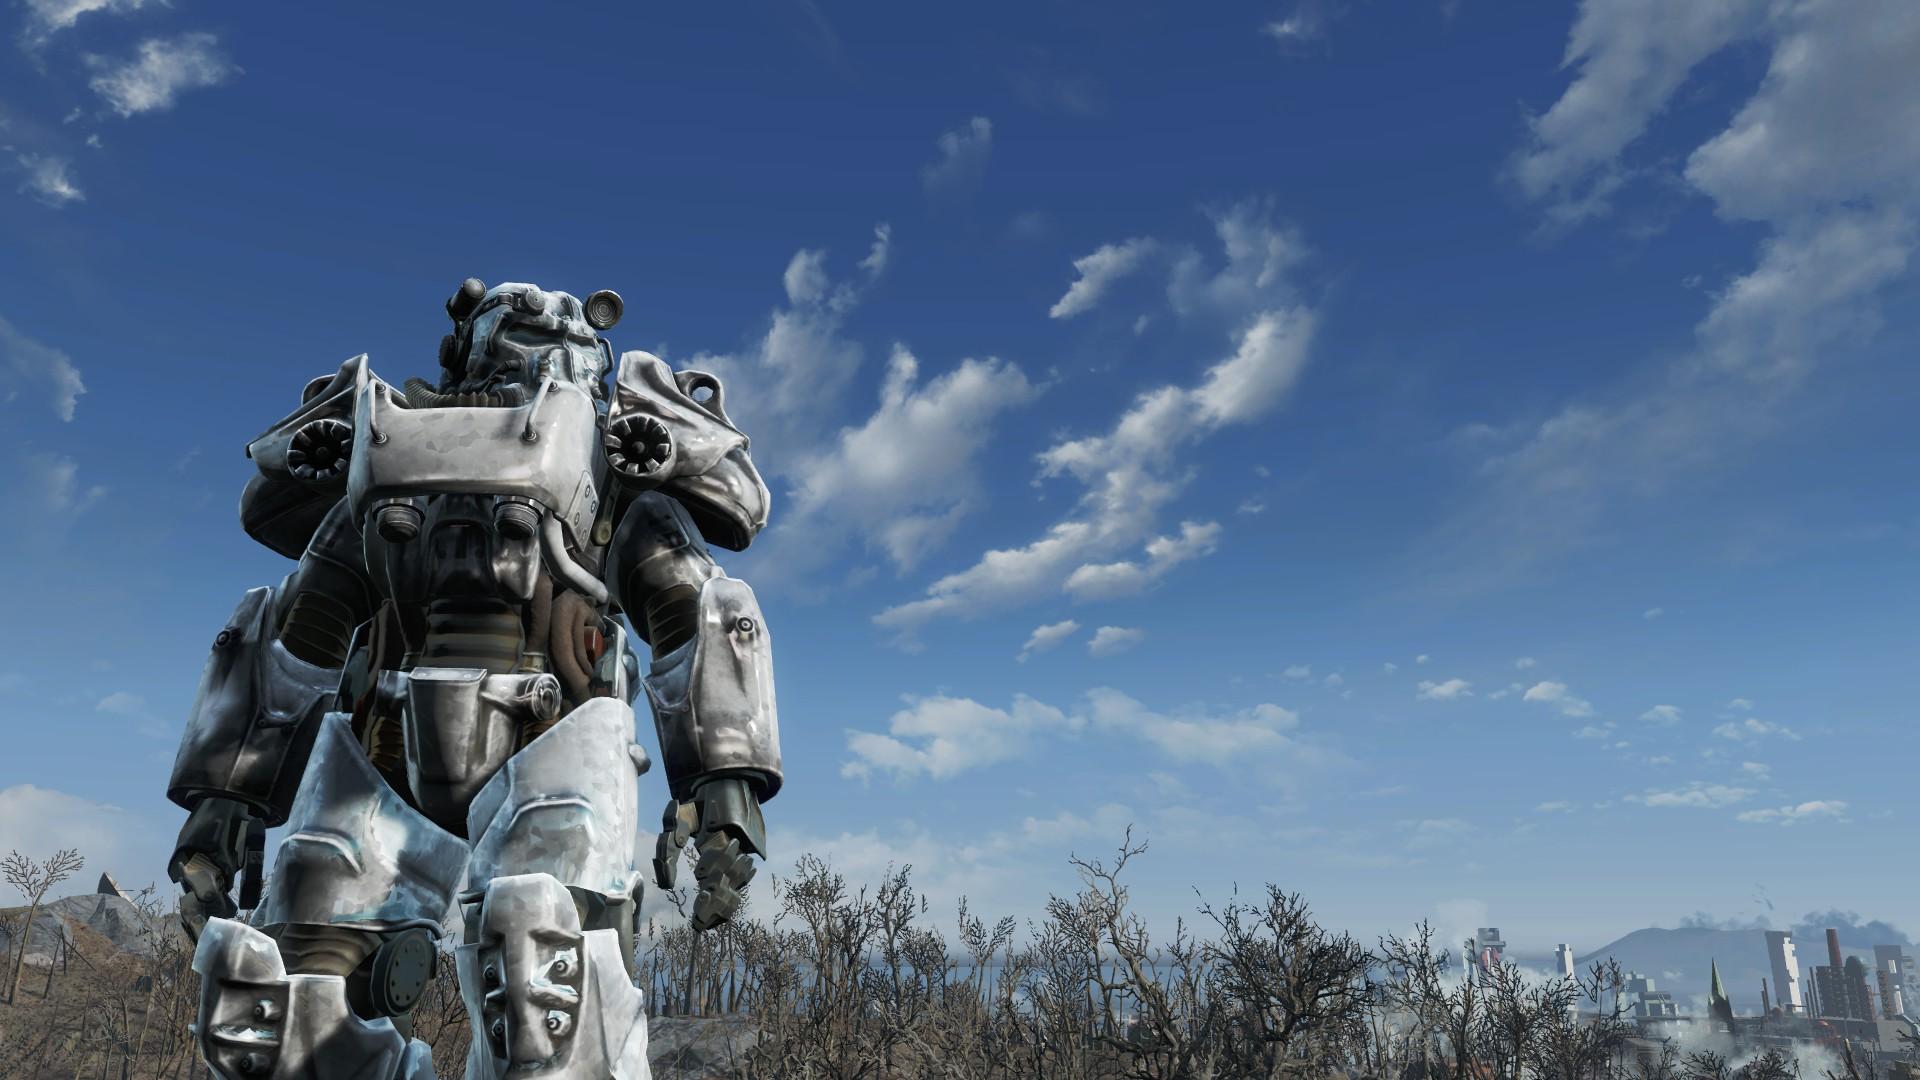 20190407205602_1.jpg - Fallout 4